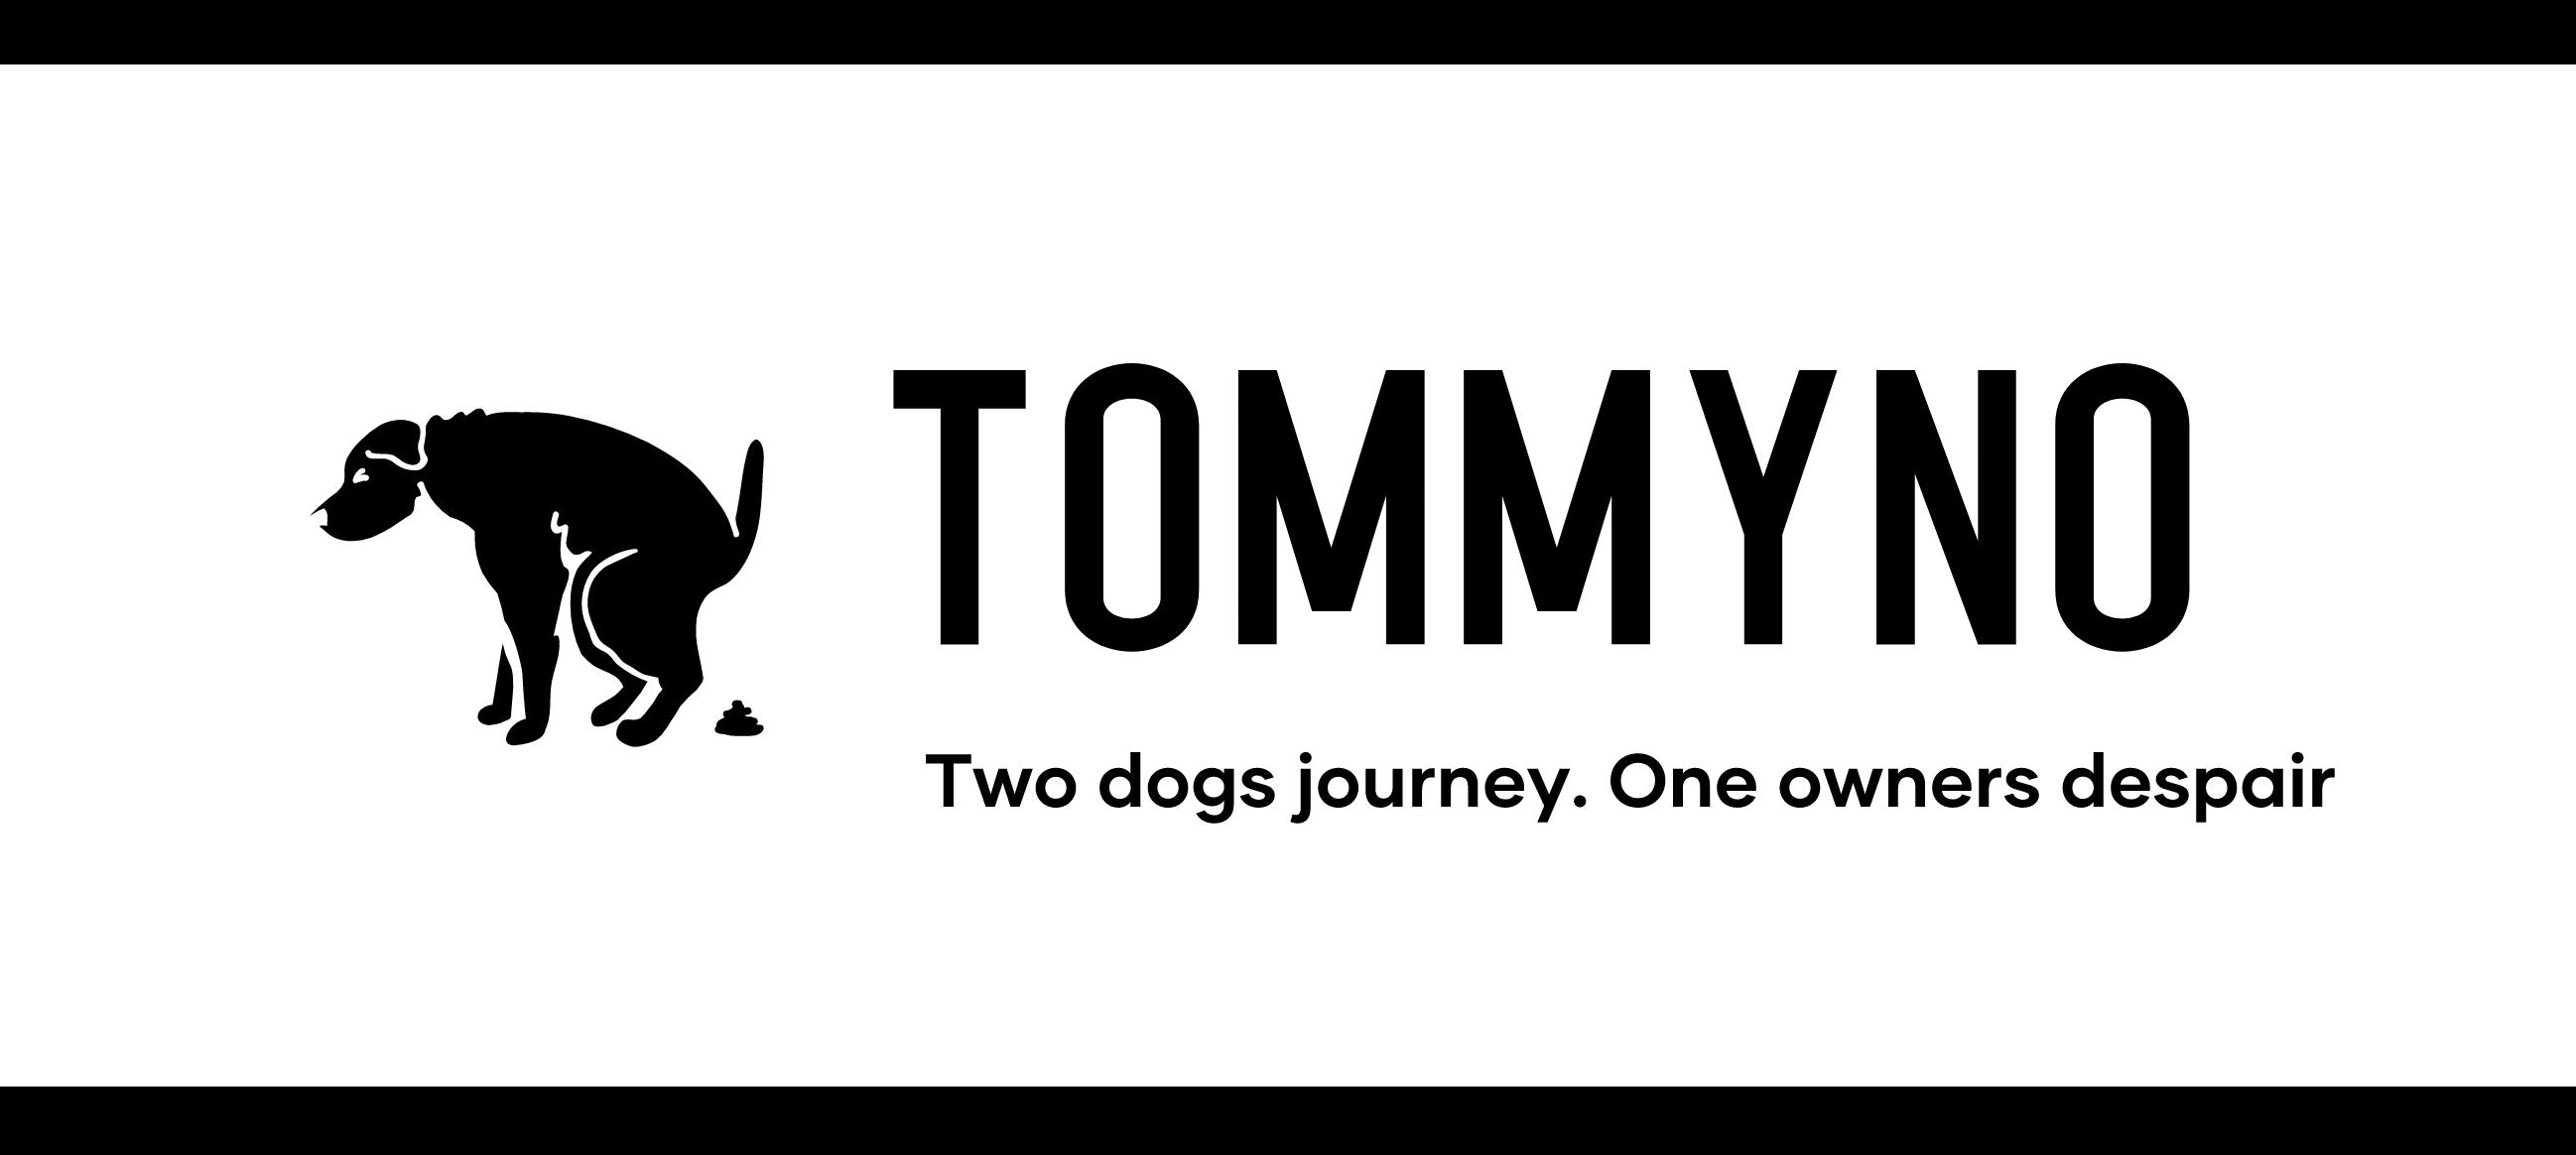 Tommyno